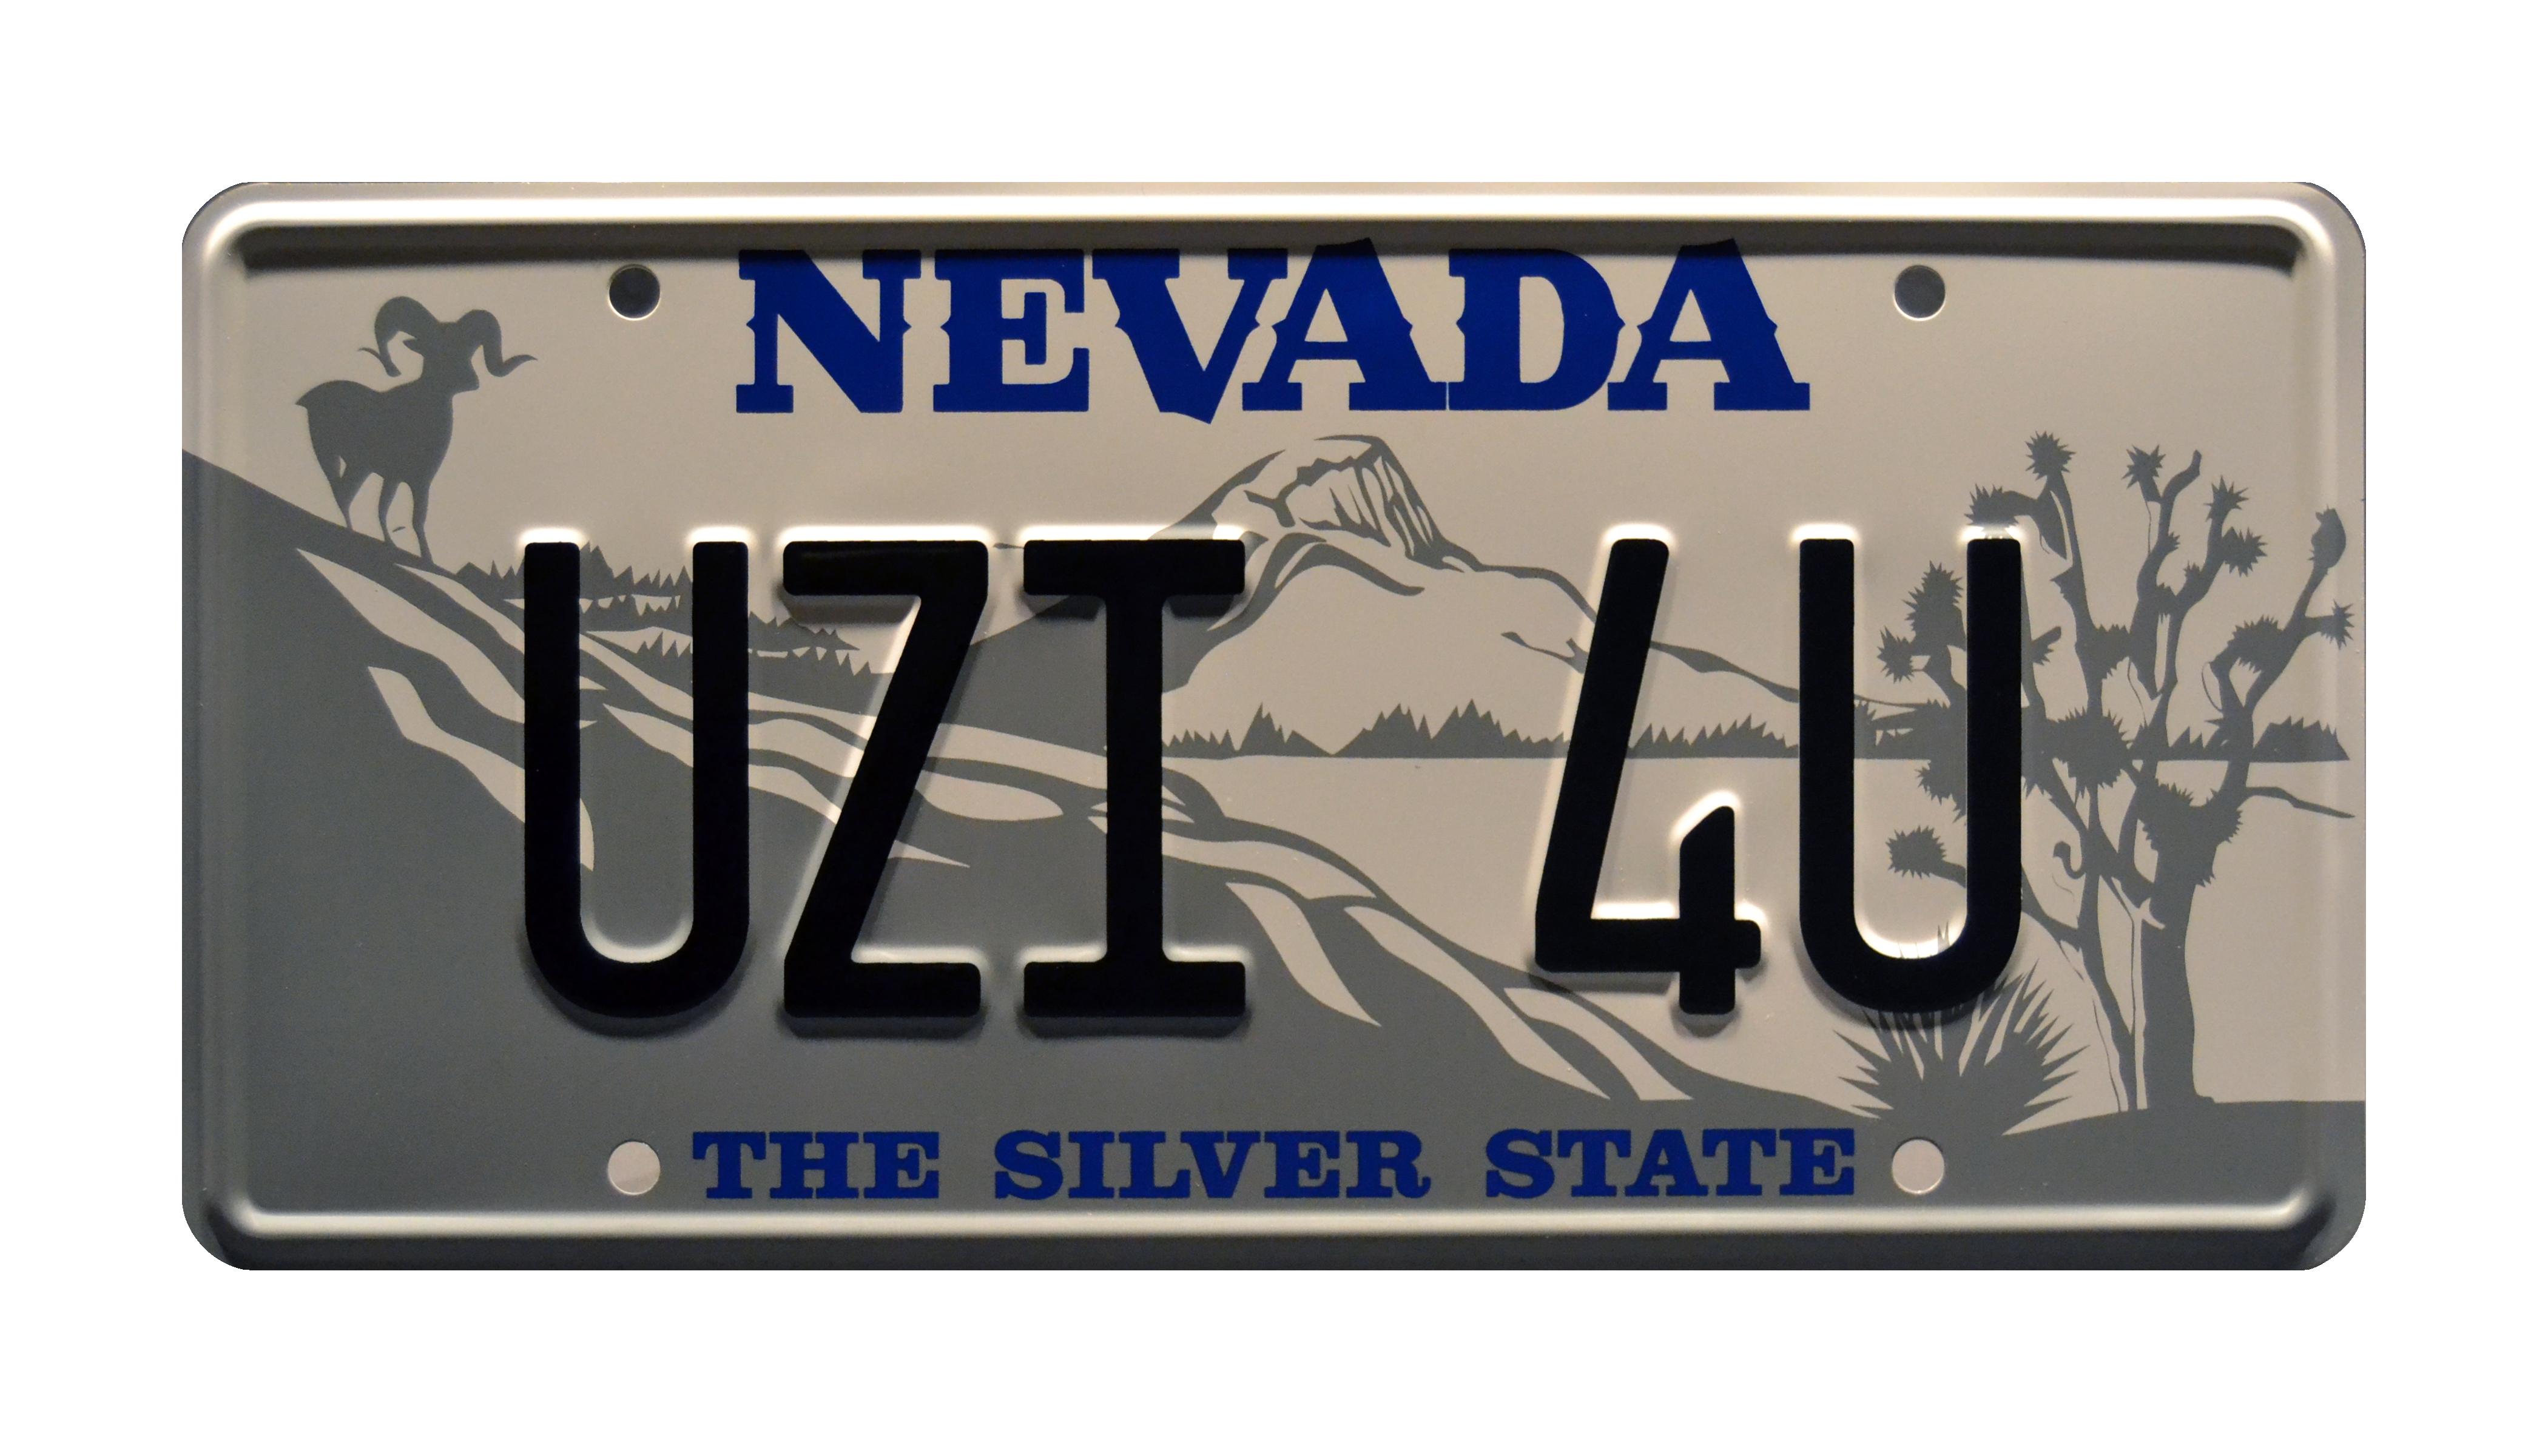 Tremors Burt Gummer S Gmc Jimmy License Plate Replica Prop